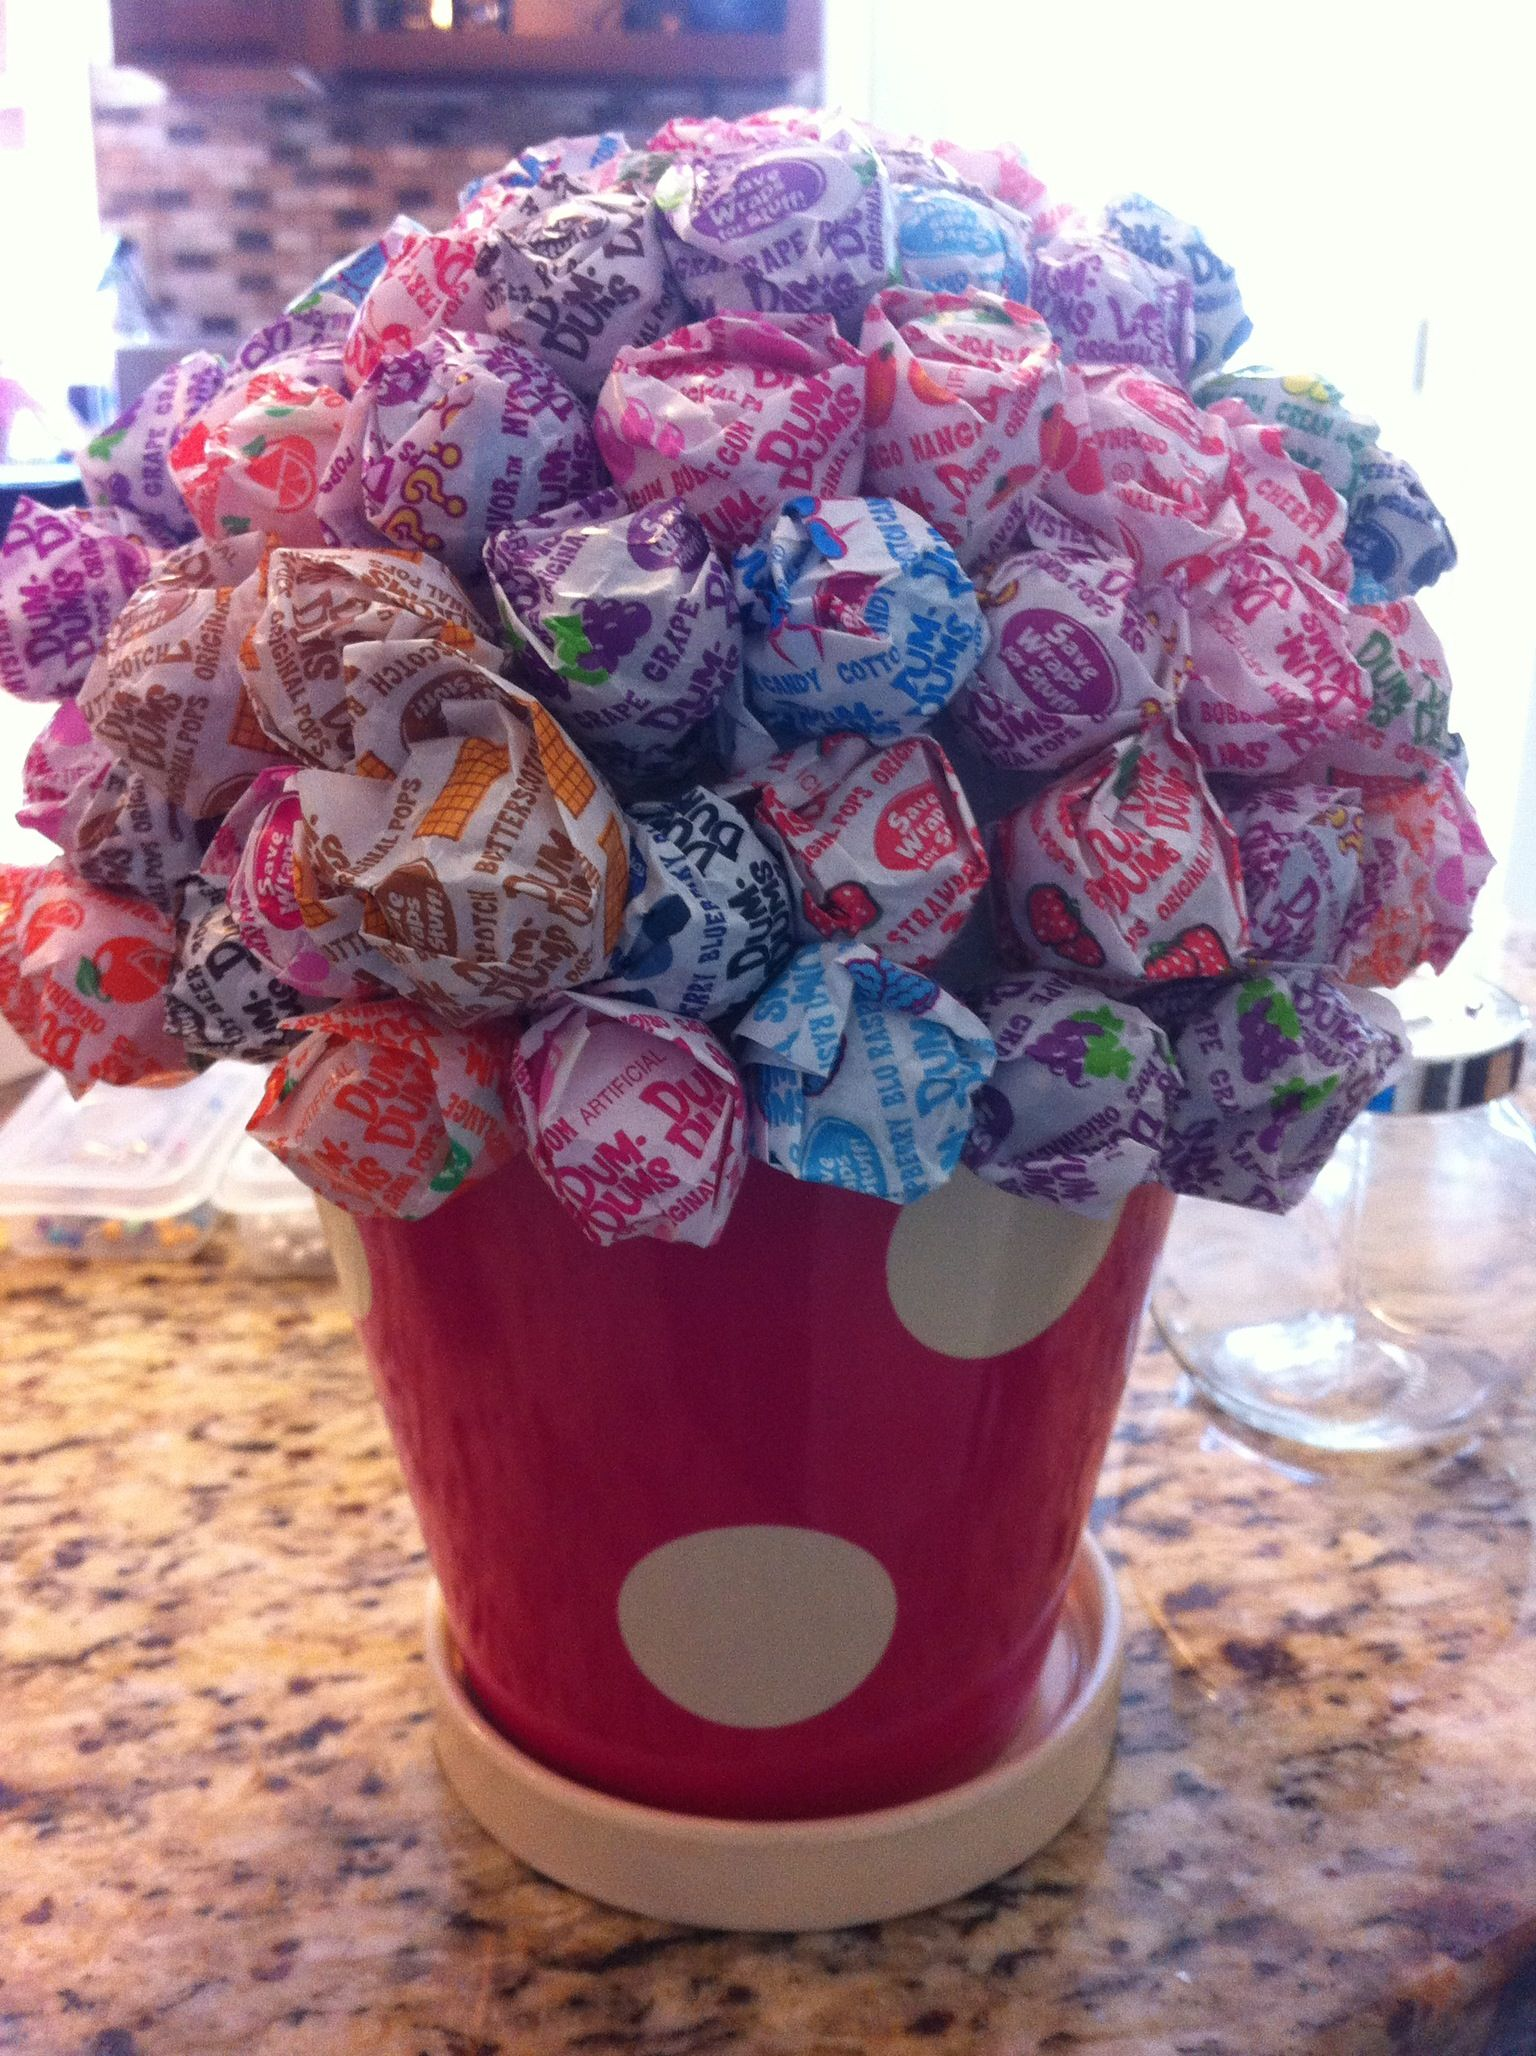 Lollipop flower planter used a ball styrofoam in a cheap planter lollipop flower planter used a ball styrofoam in a cheap planter and poke the dums dums until it was all filled izmirmasajfo